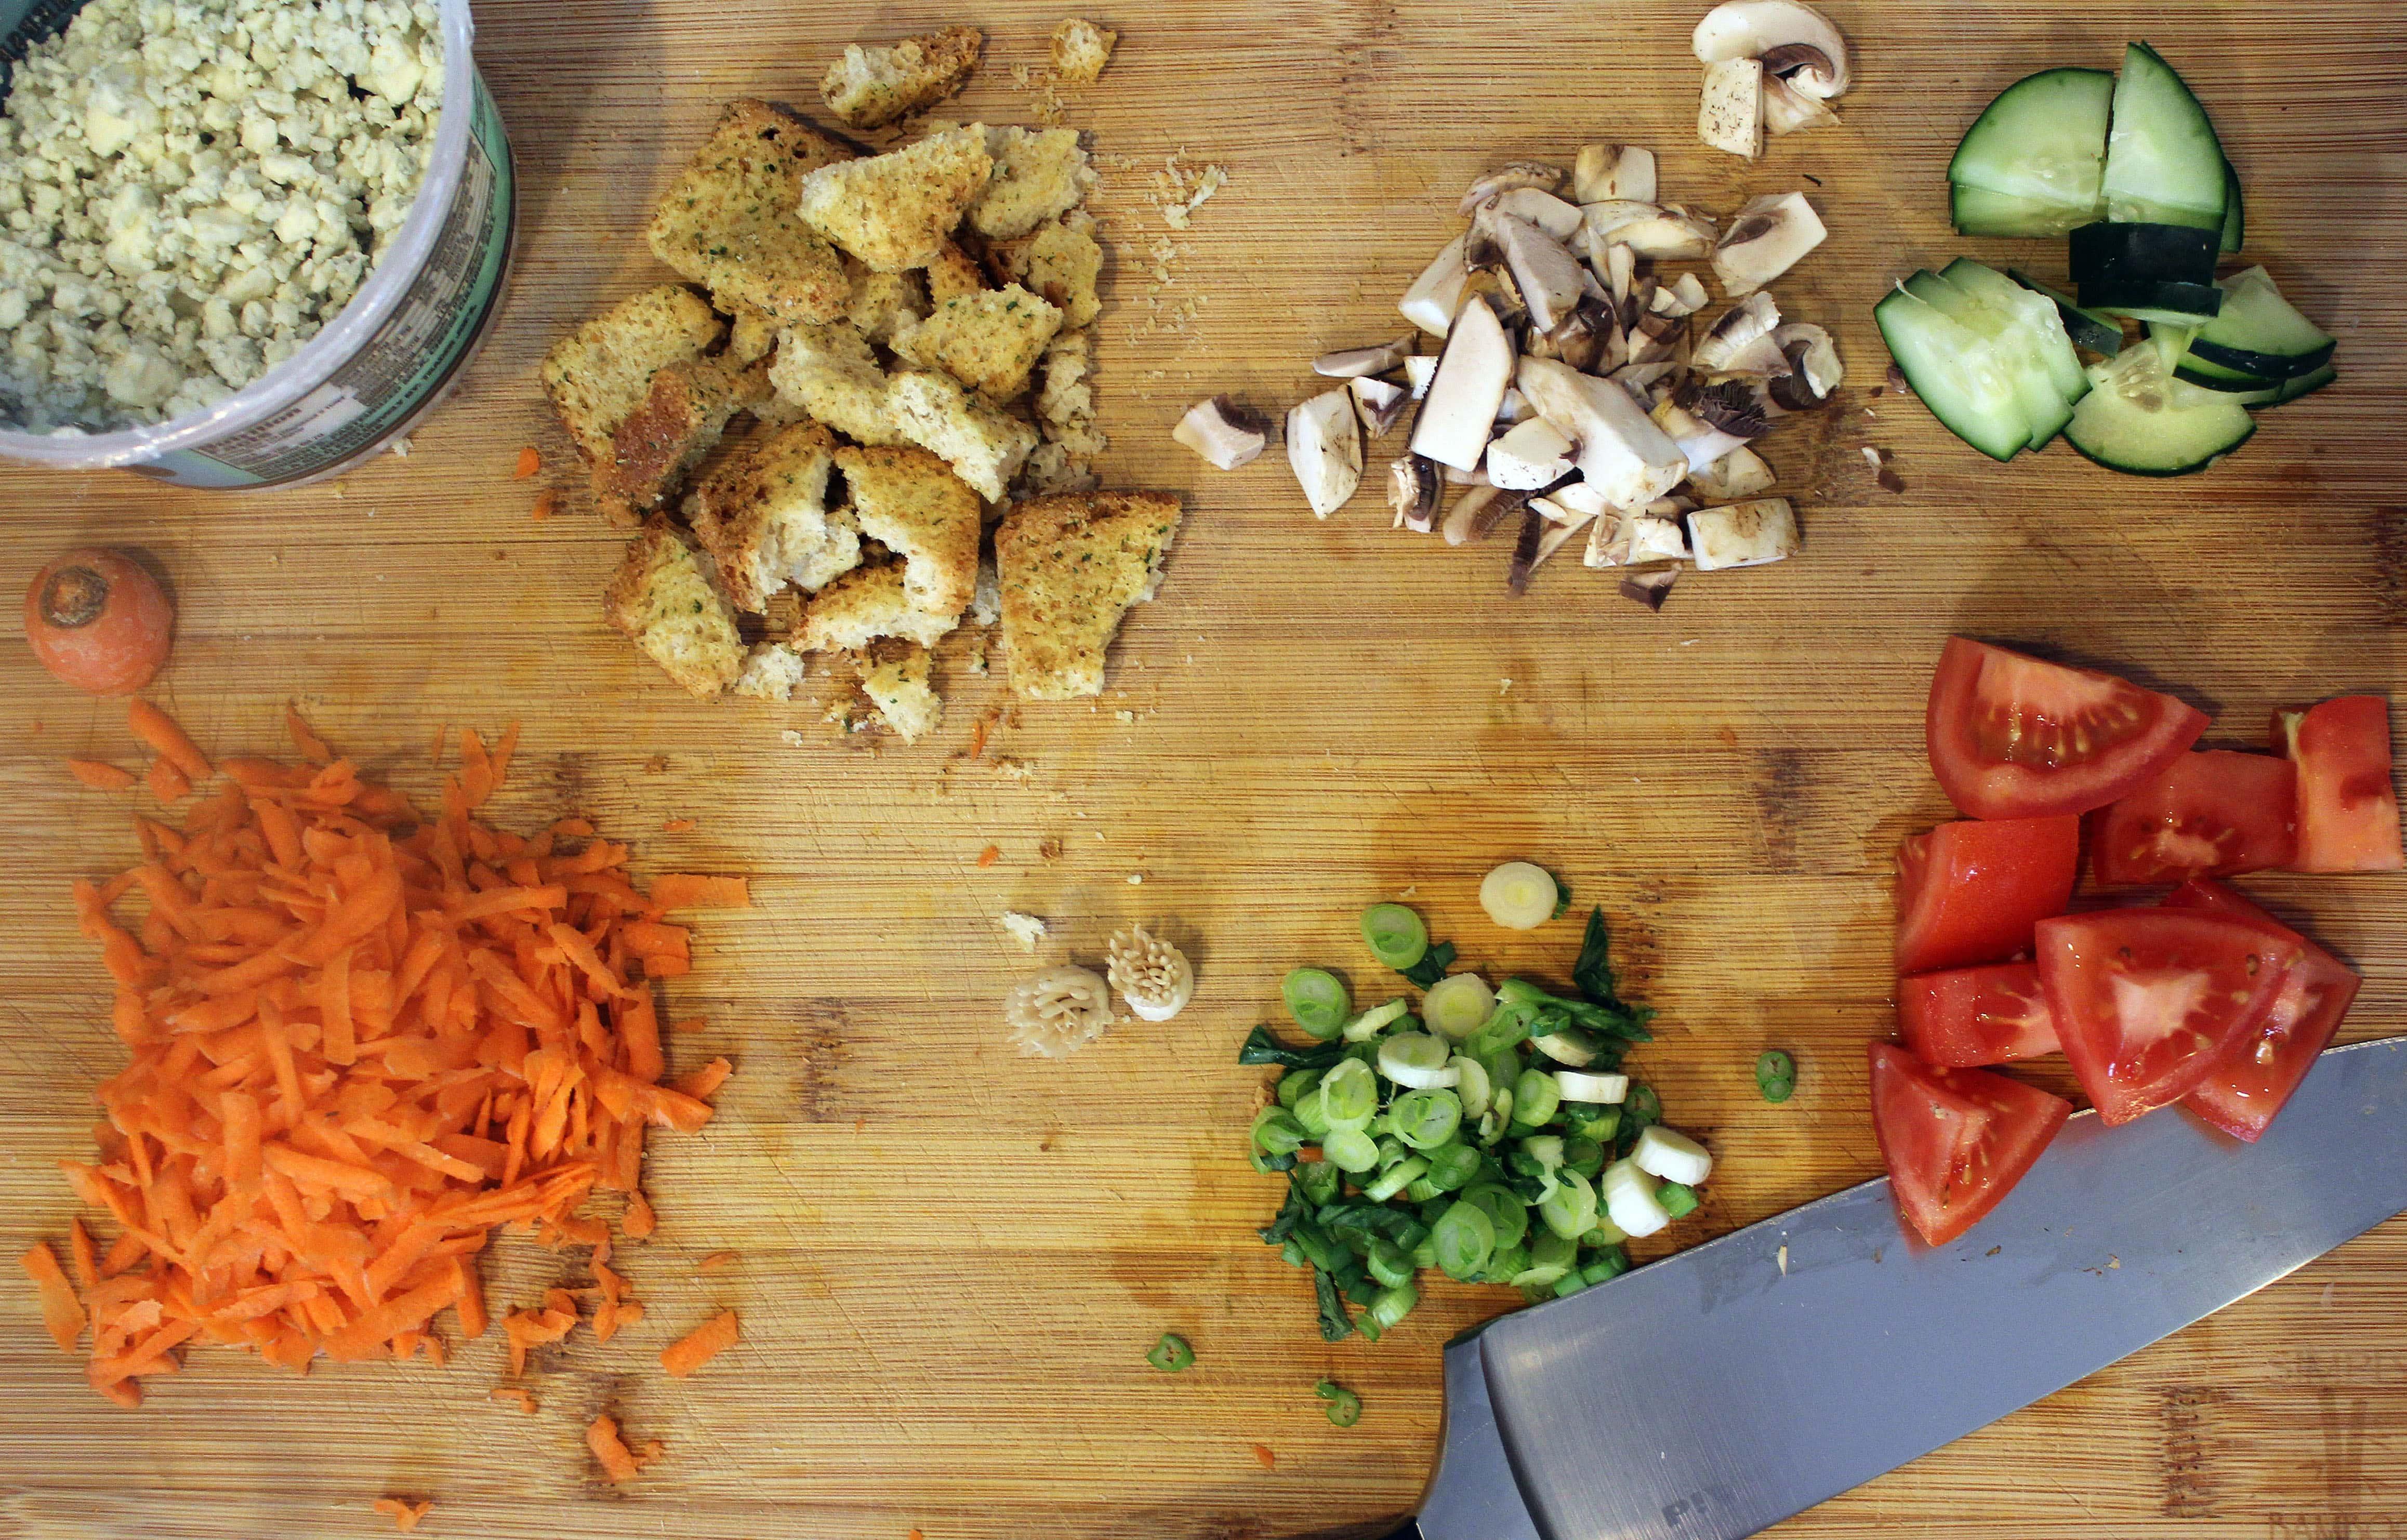 Prep veggies for salad building